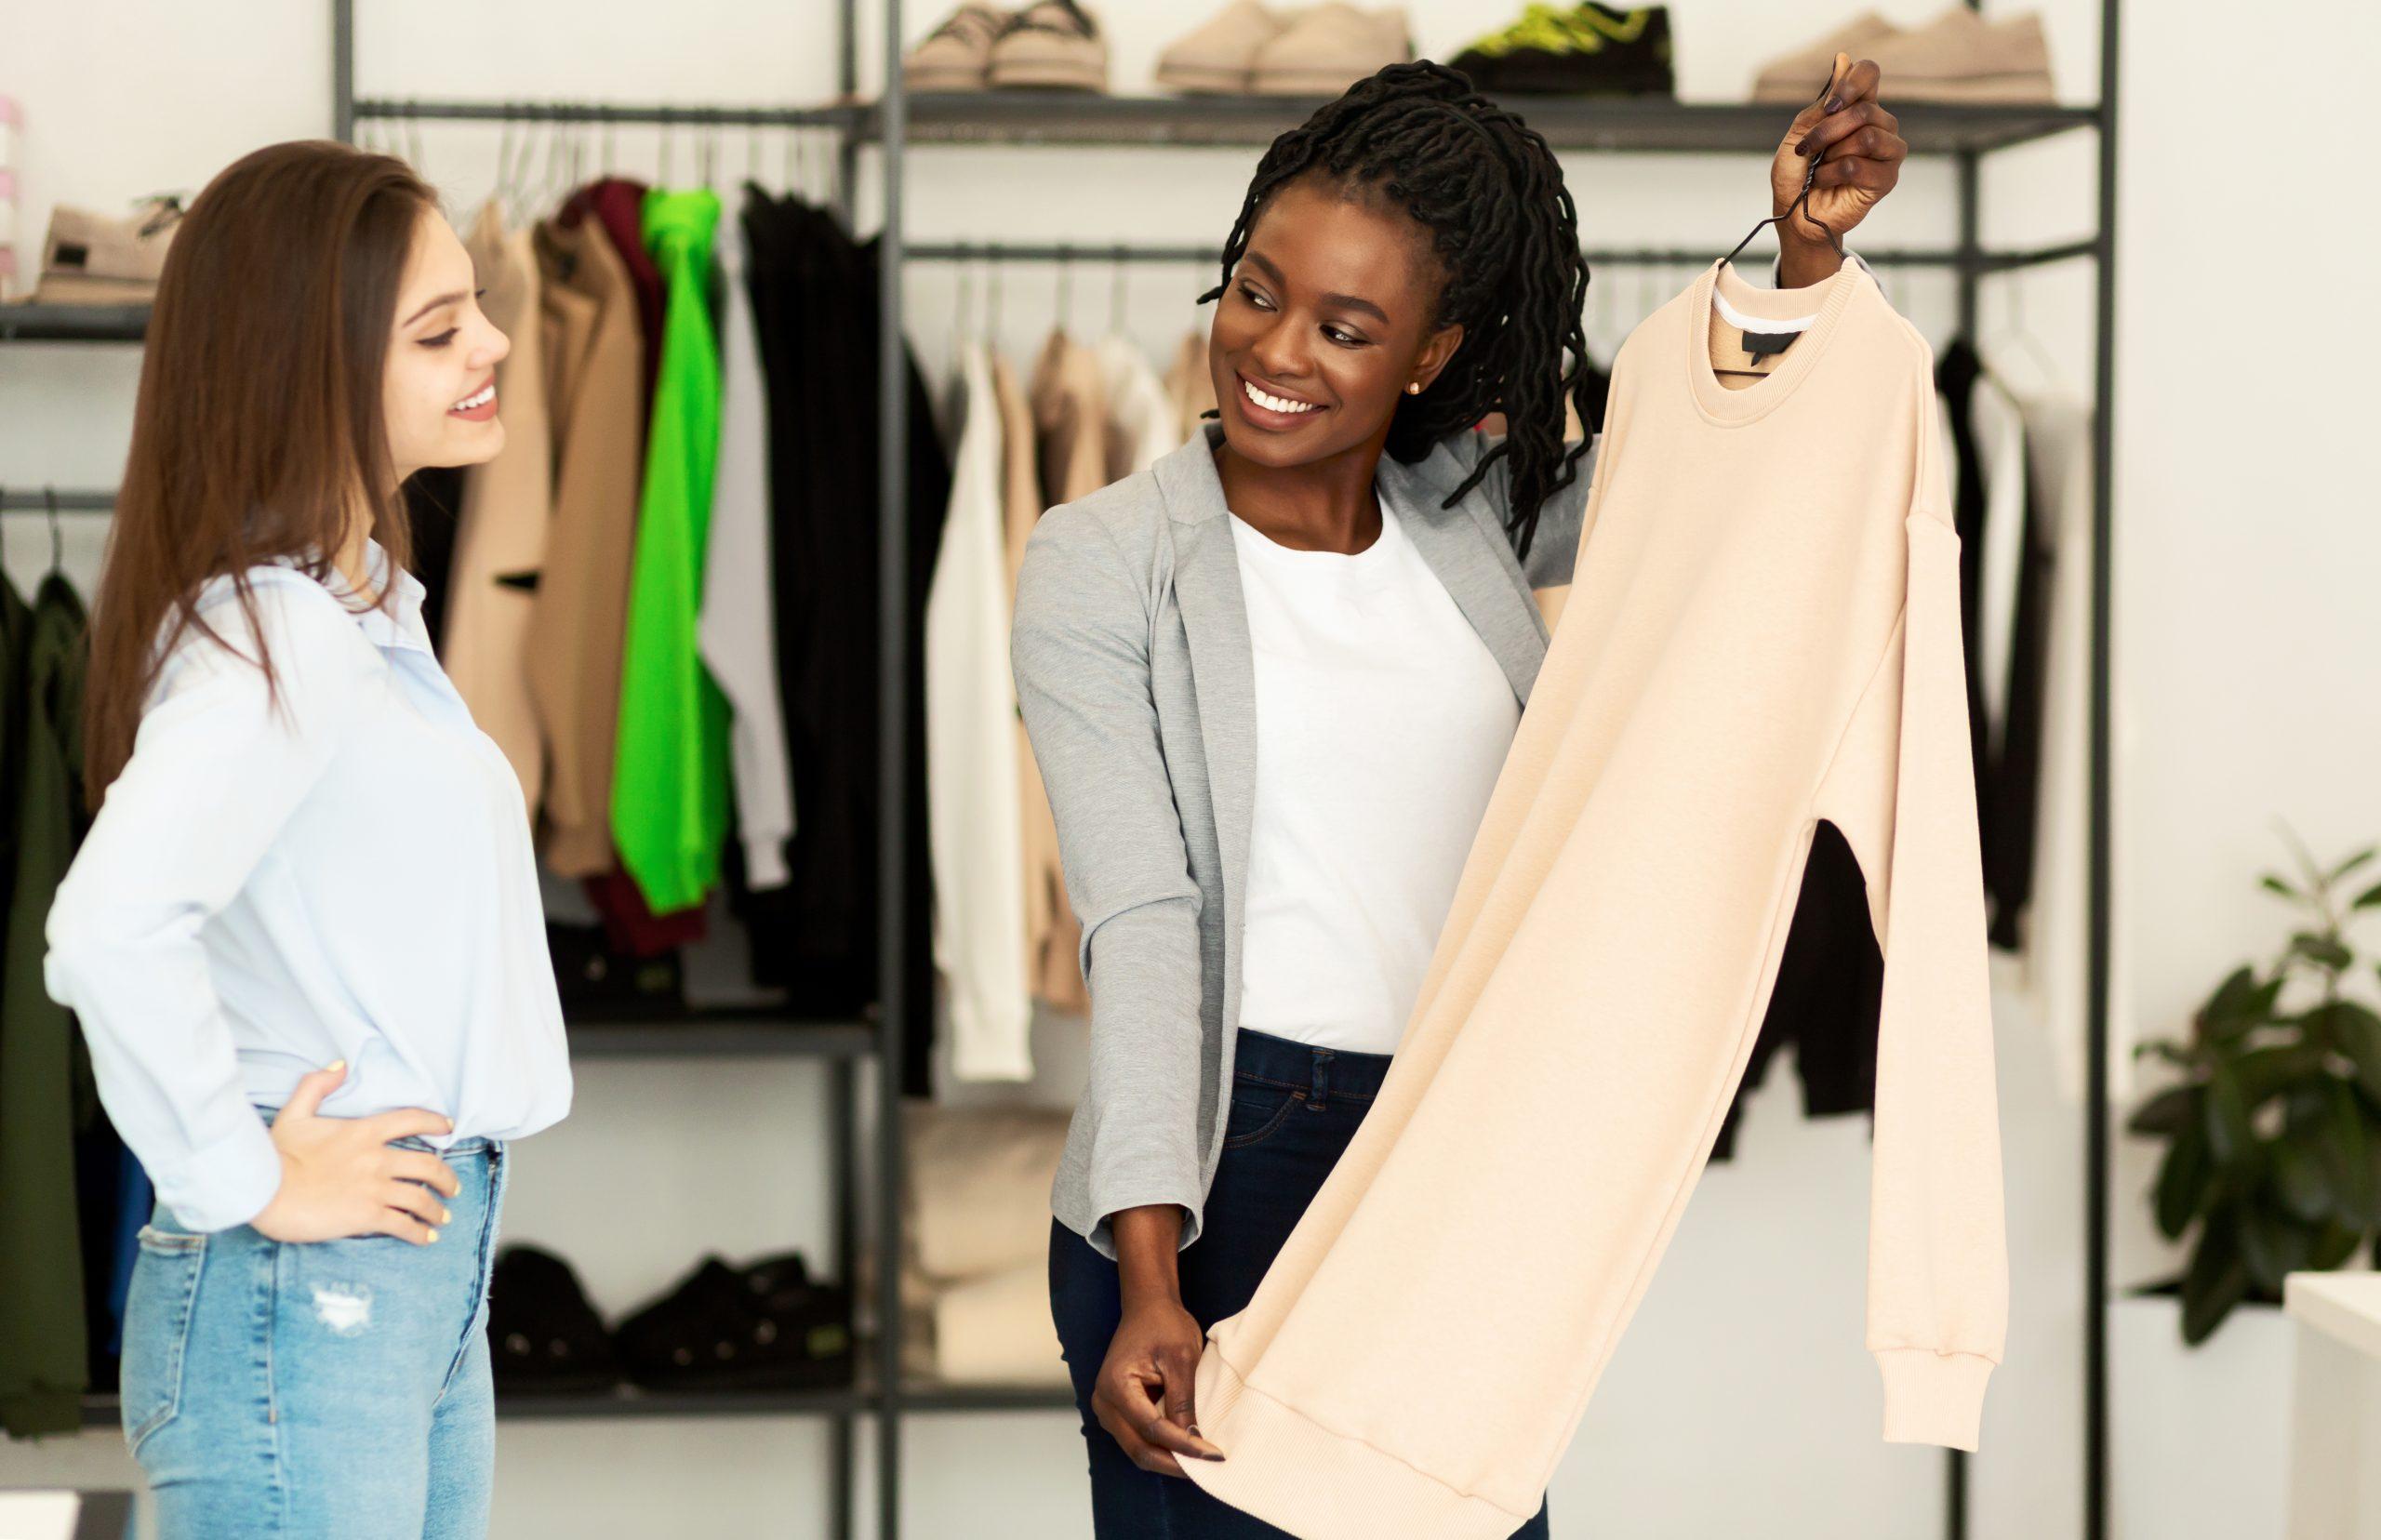 photoshoot wardrobe tips